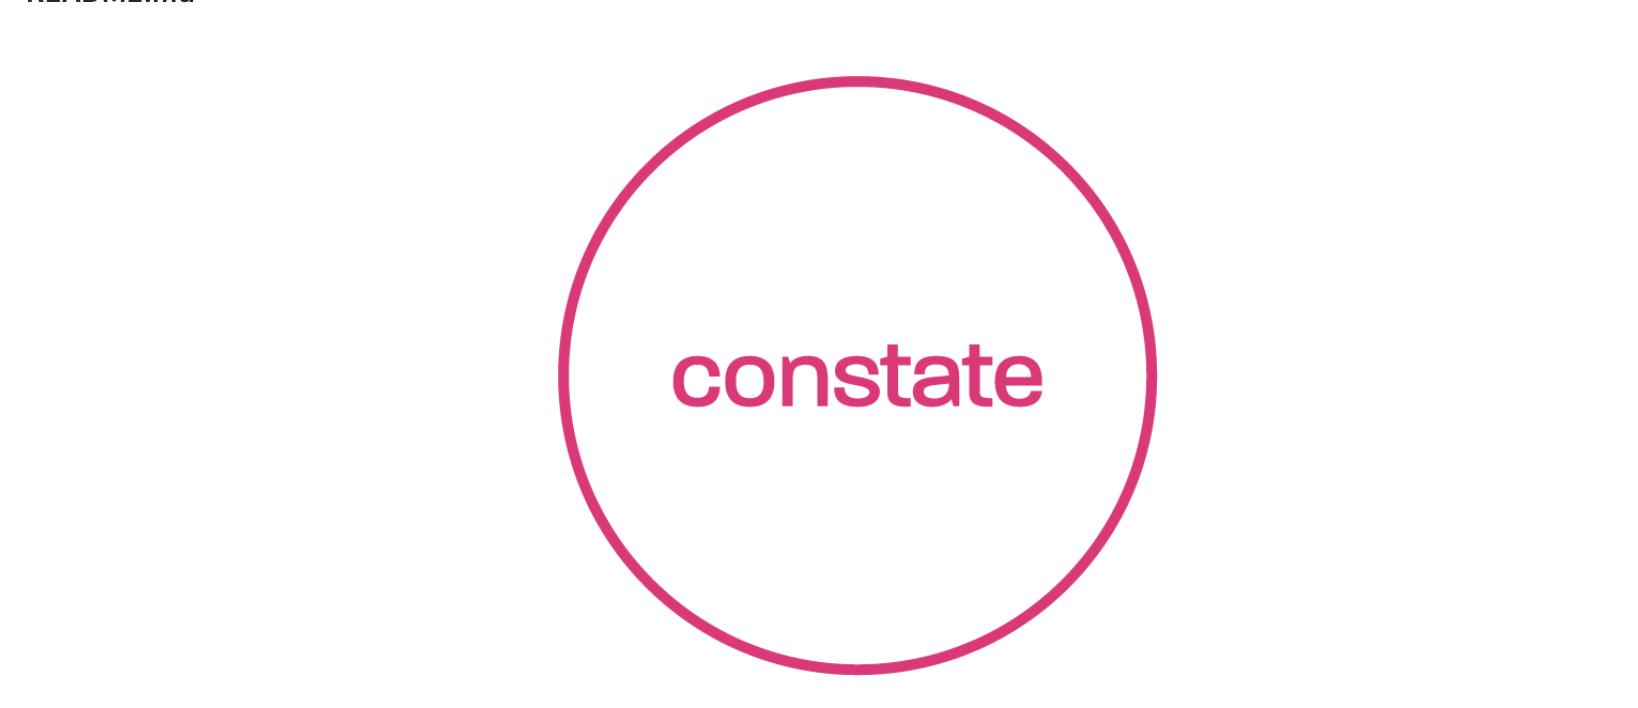 Constate